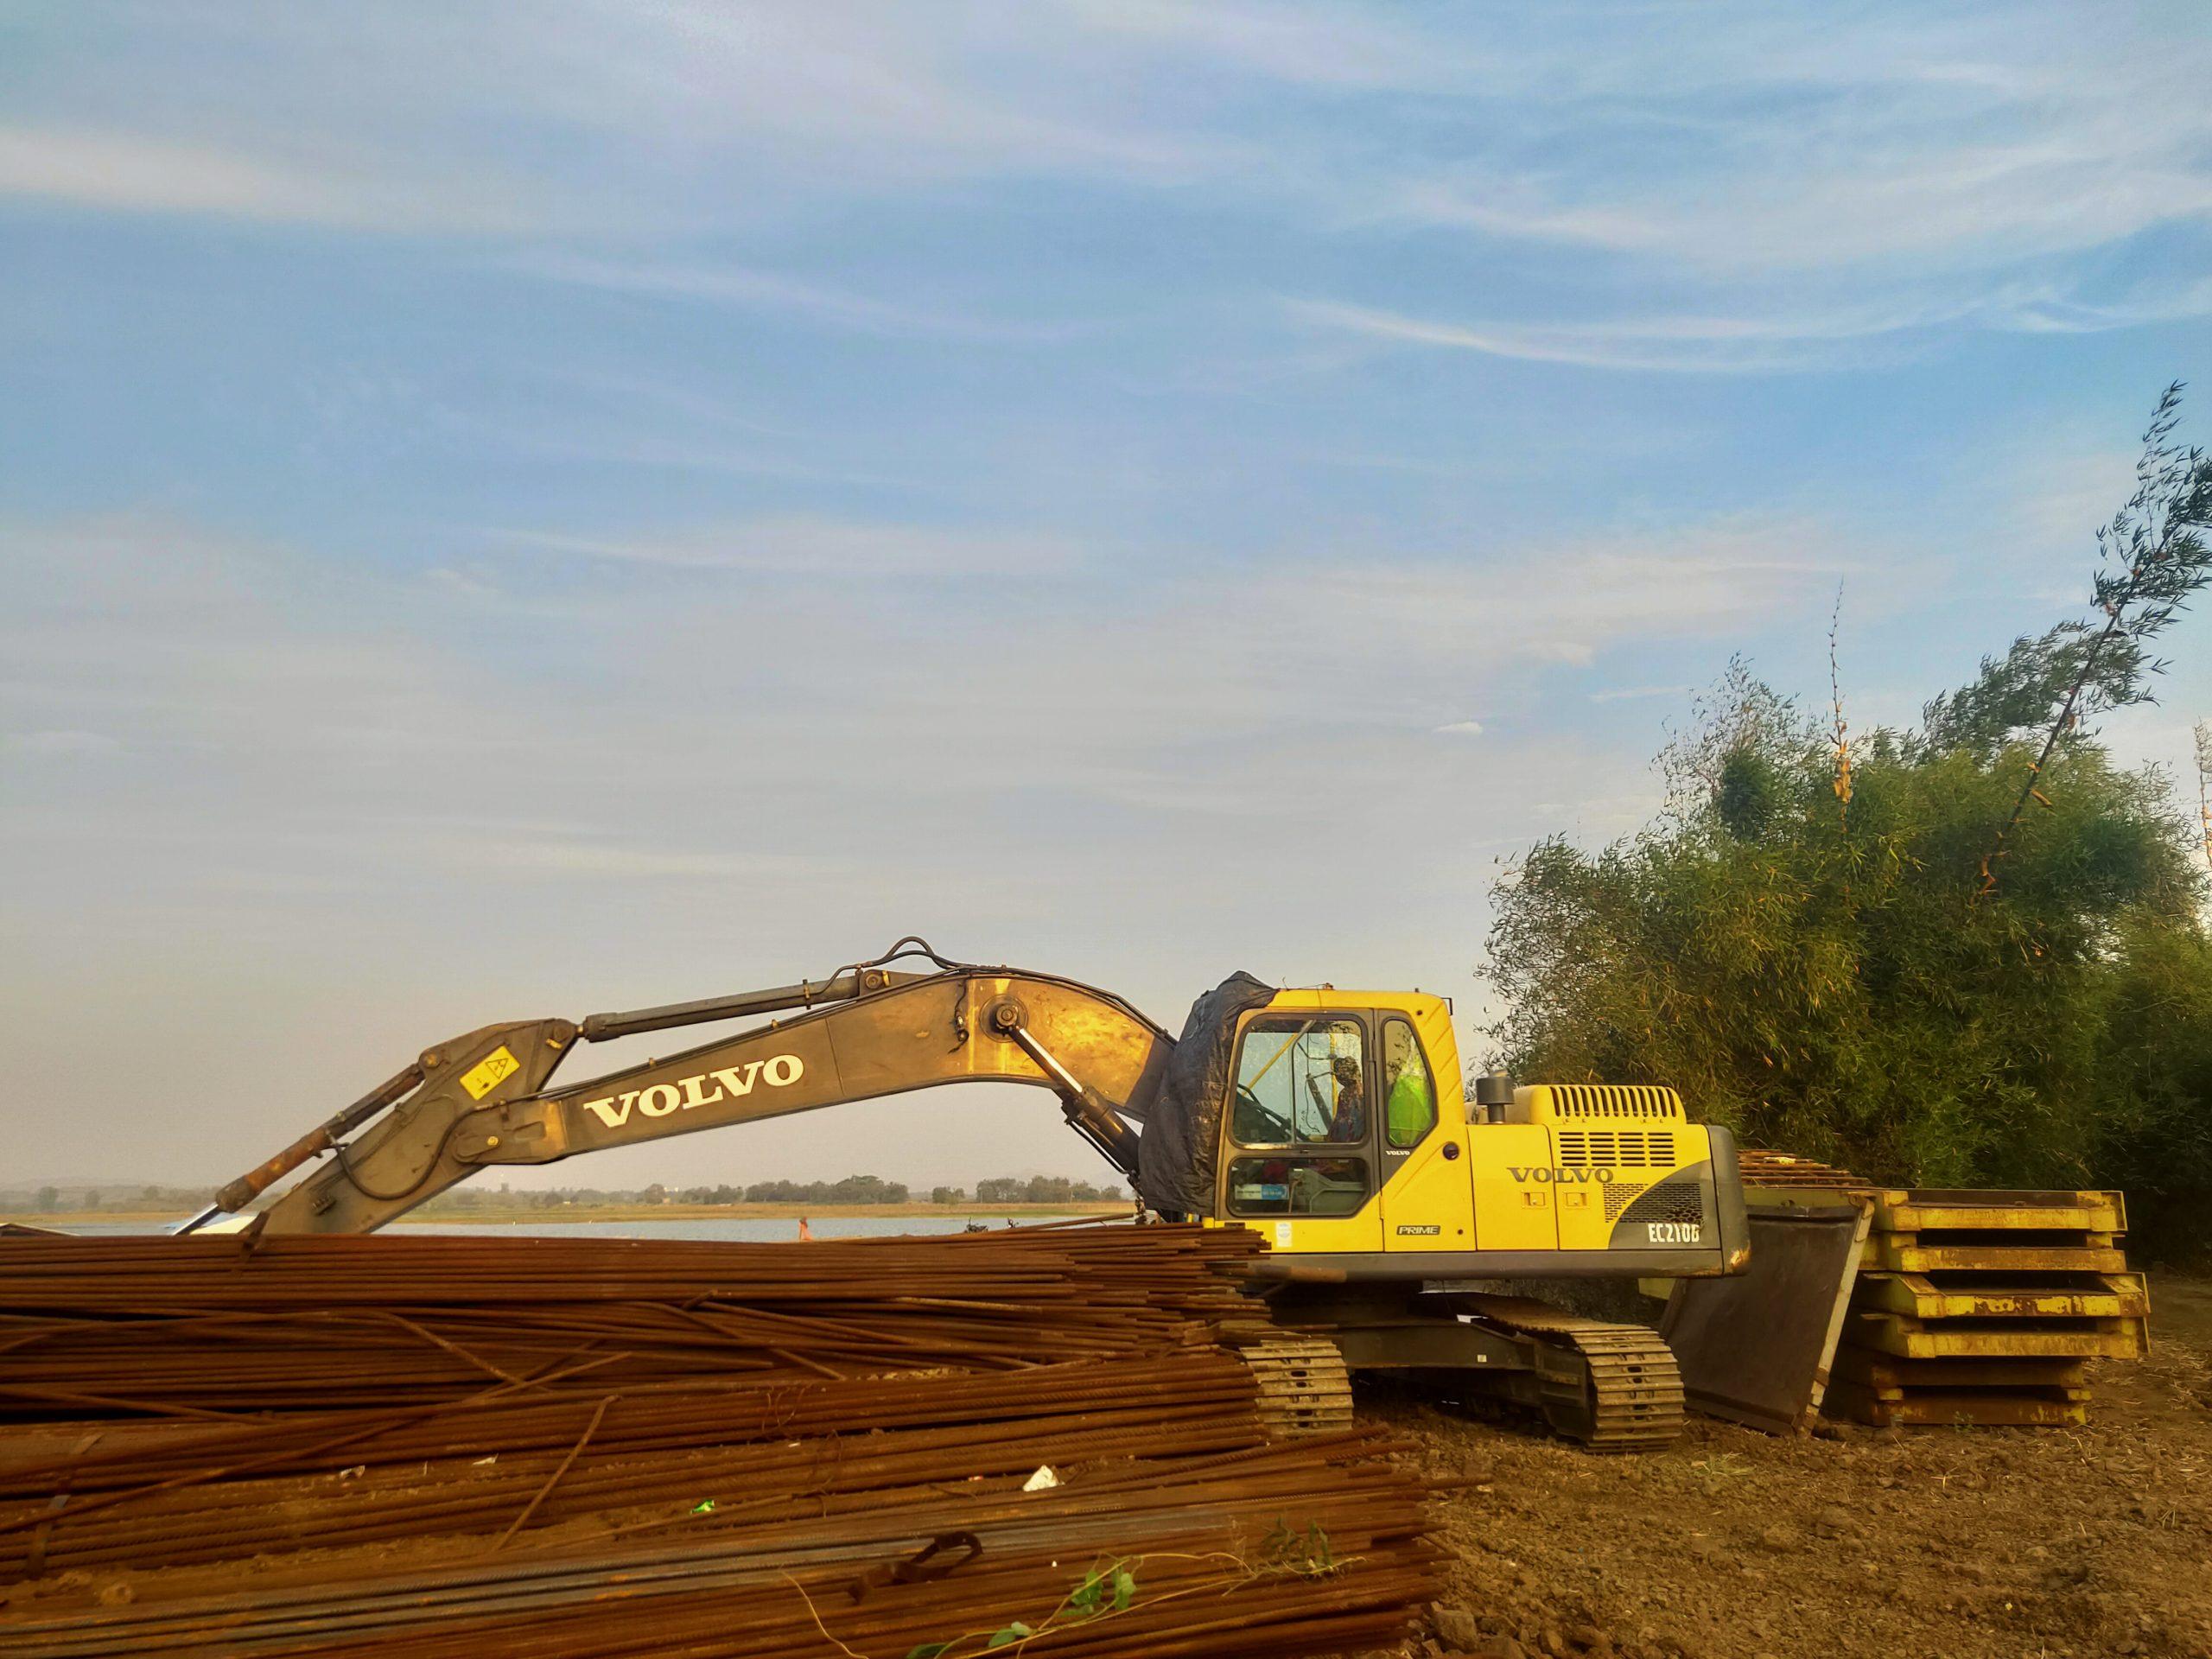 Bulldozer in construction field